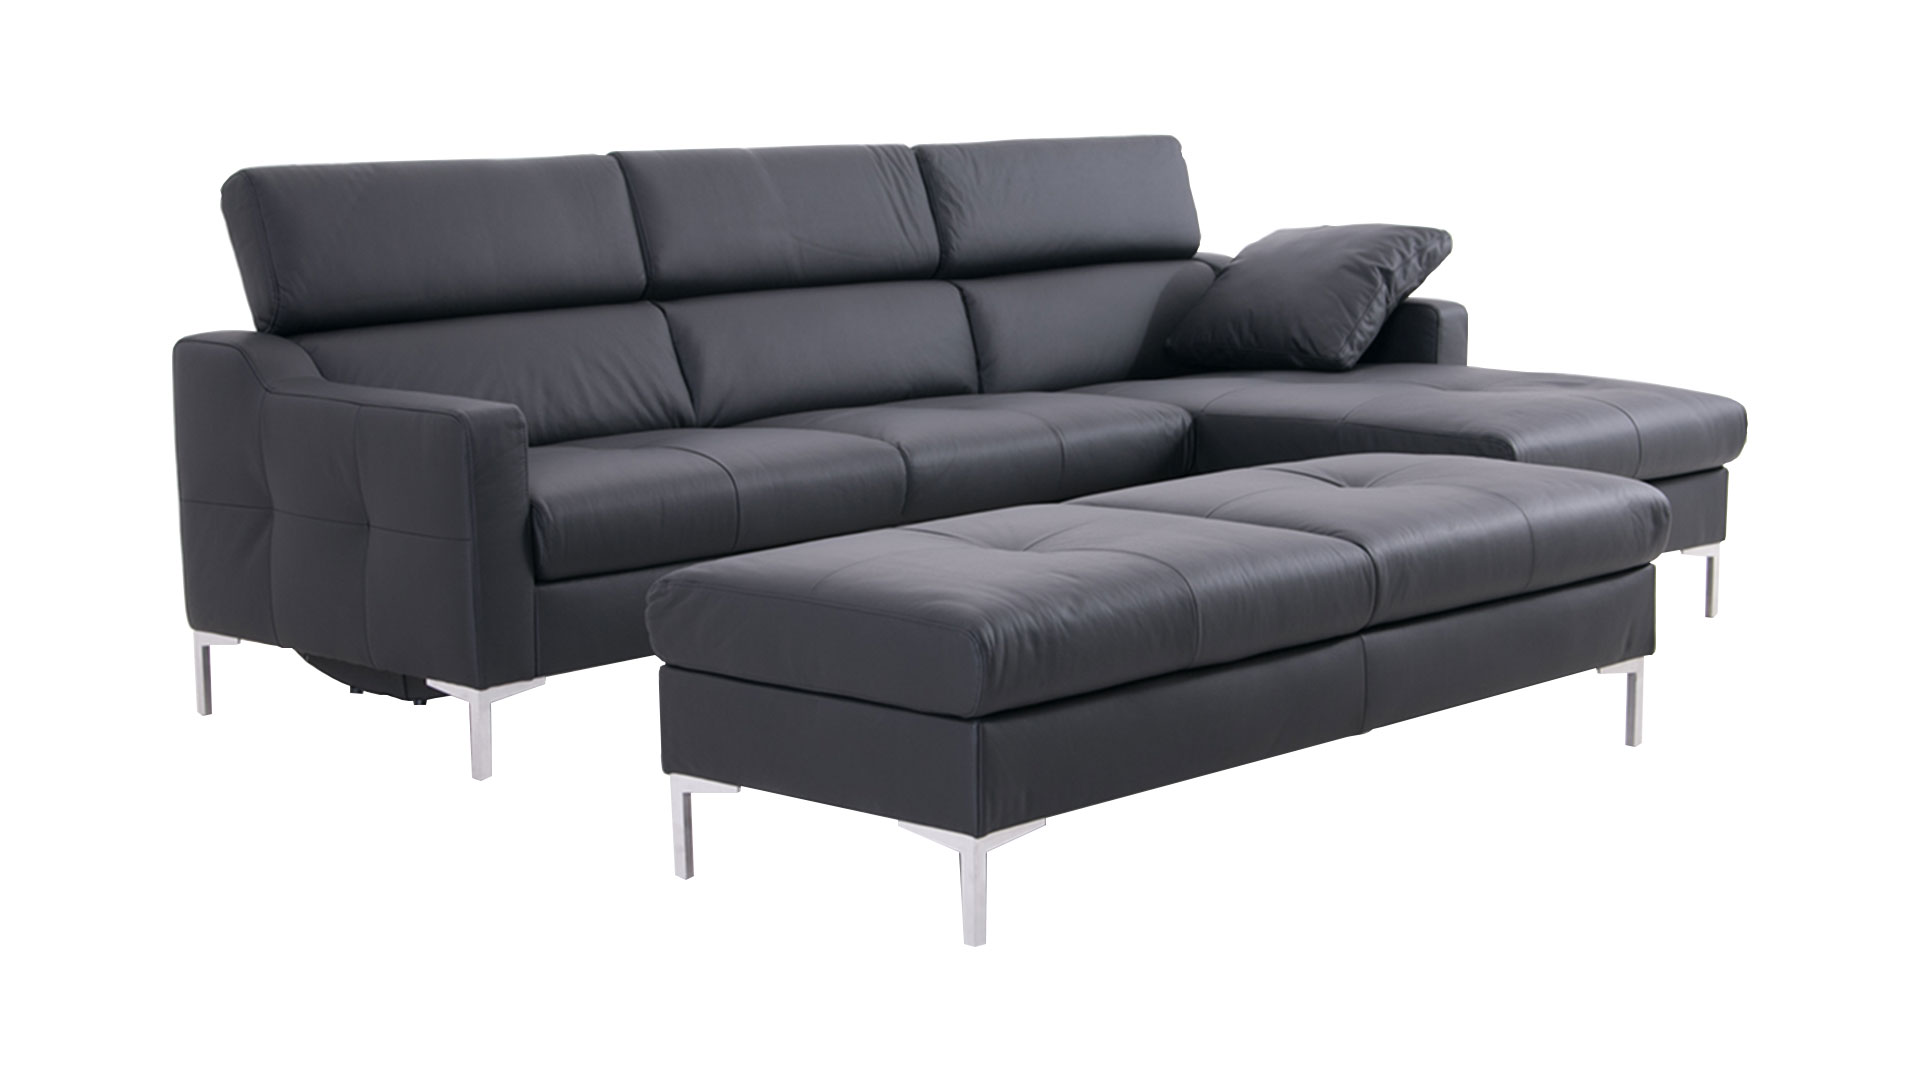 ewald schillig face trendy e schillig eros with e. Black Bedroom Furniture Sets. Home Design Ideas